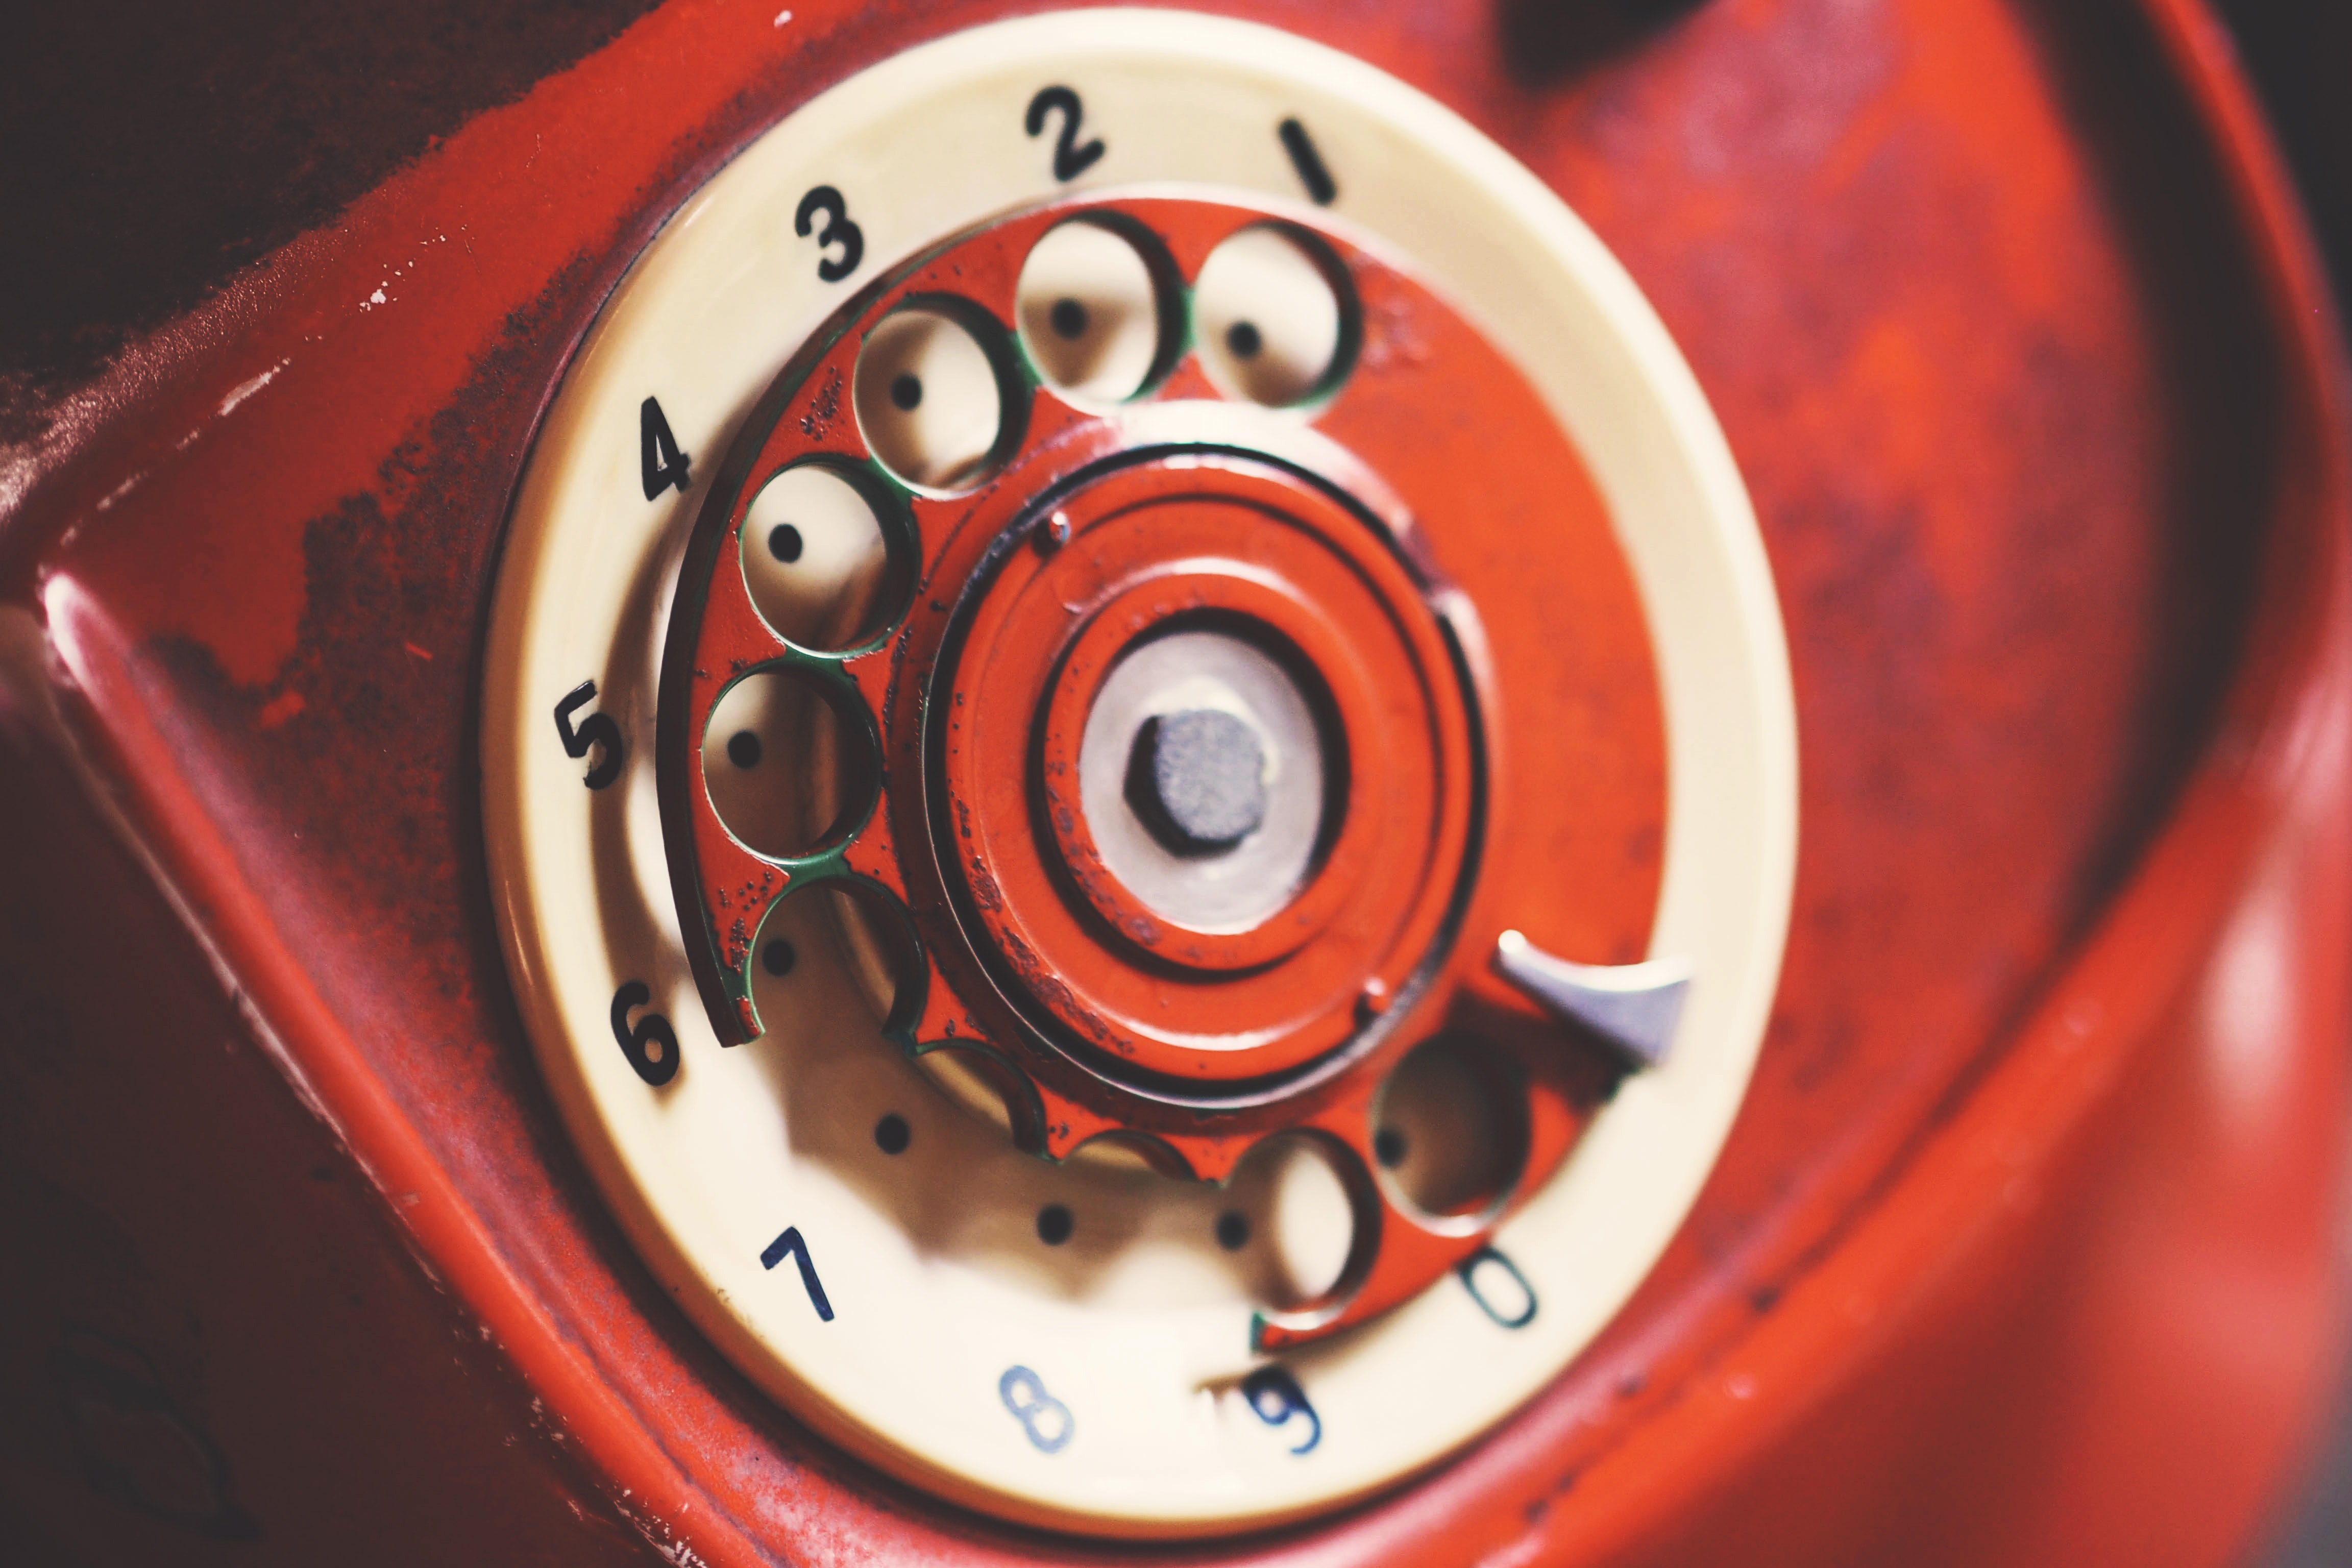 Free photo: Close-up Photo of Rotary Telephone - Retro, Ring